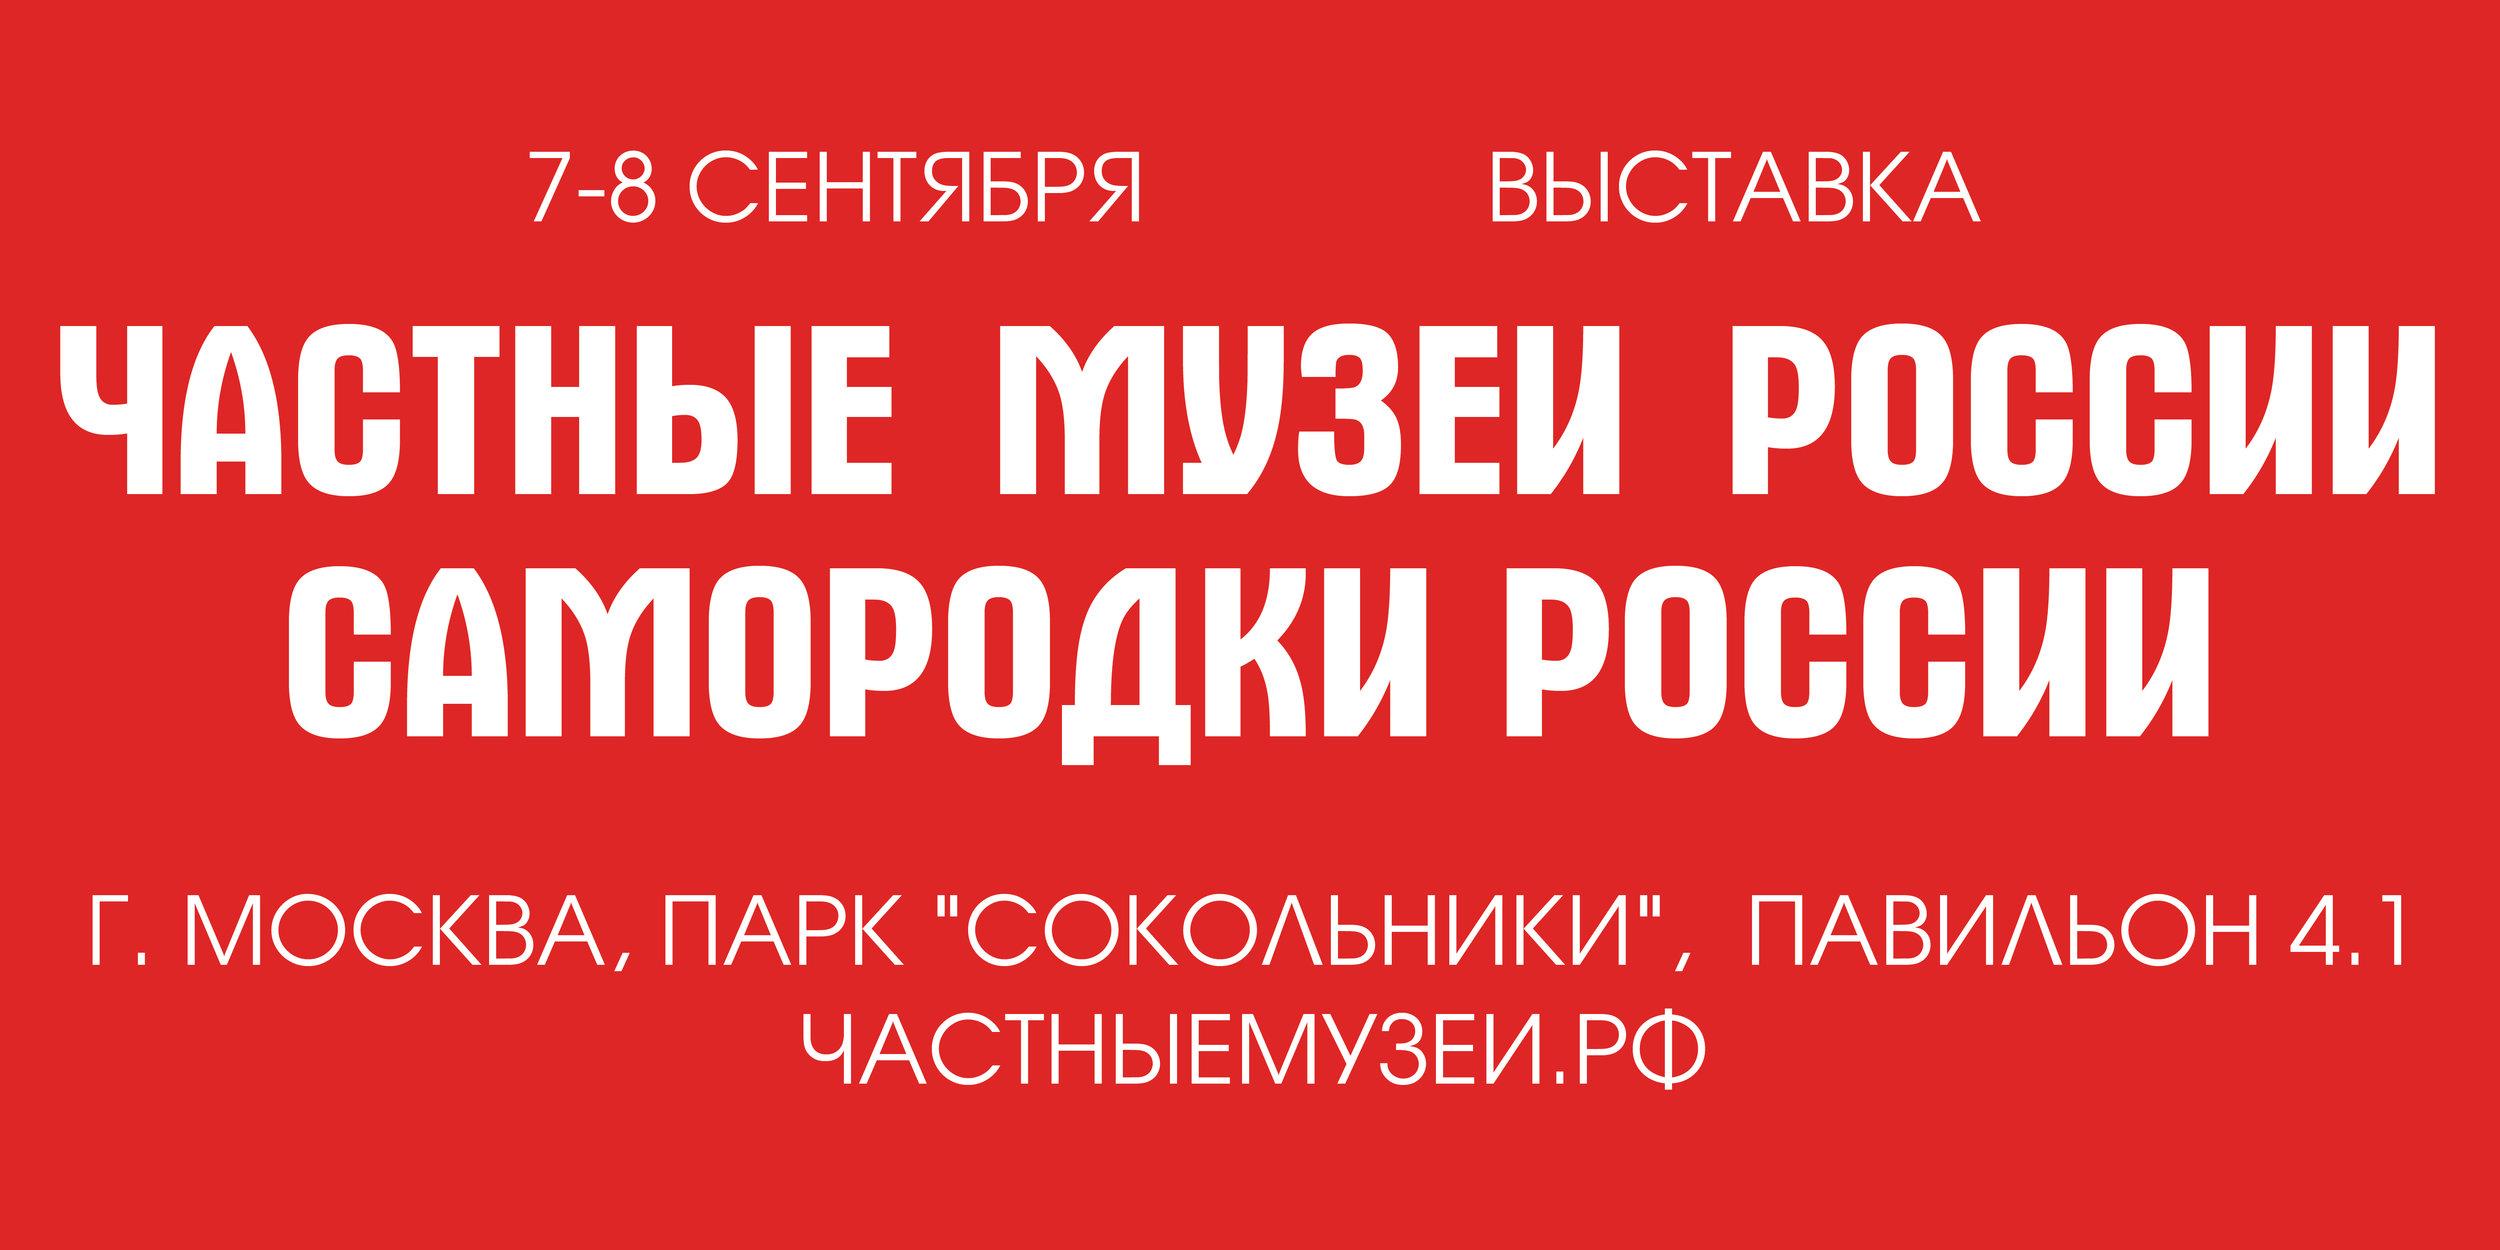 Баннер 1.jpg